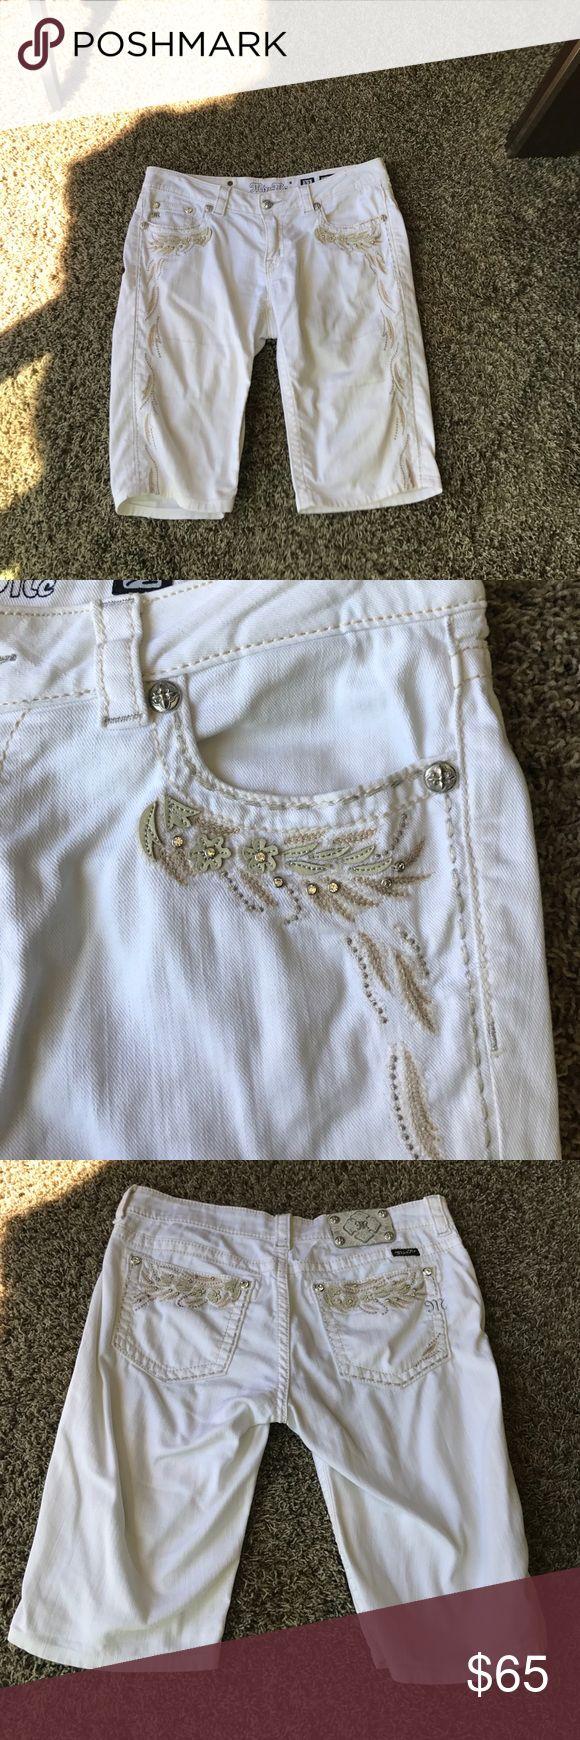 Miss Me white Bermuda Capri Shorts Miss Me White Bermuda Capri shorts.  Excellent condition. Miss Me Shorts Jean Shorts